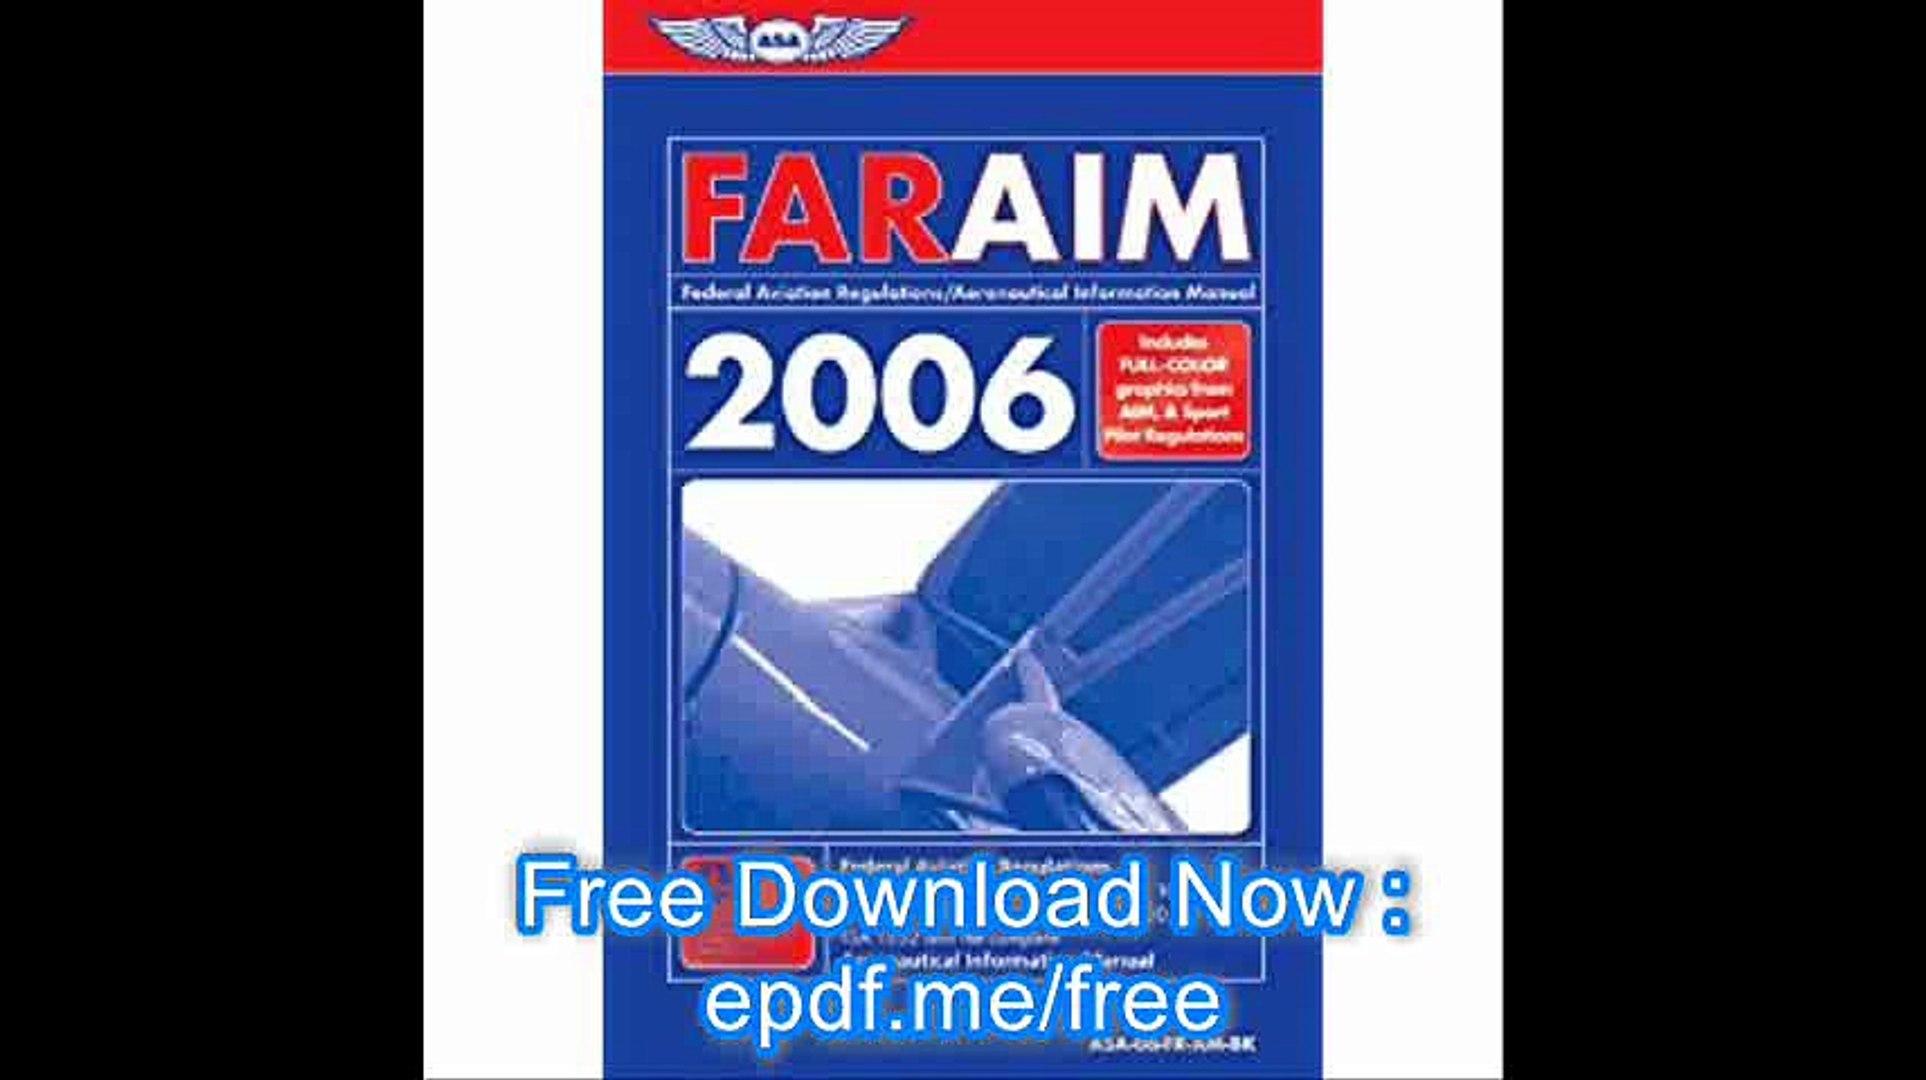 FAR-AIM 2006 Federal Aviation Regulations-Aeronautical Information Manual for 2006 (FAR-AIM series)